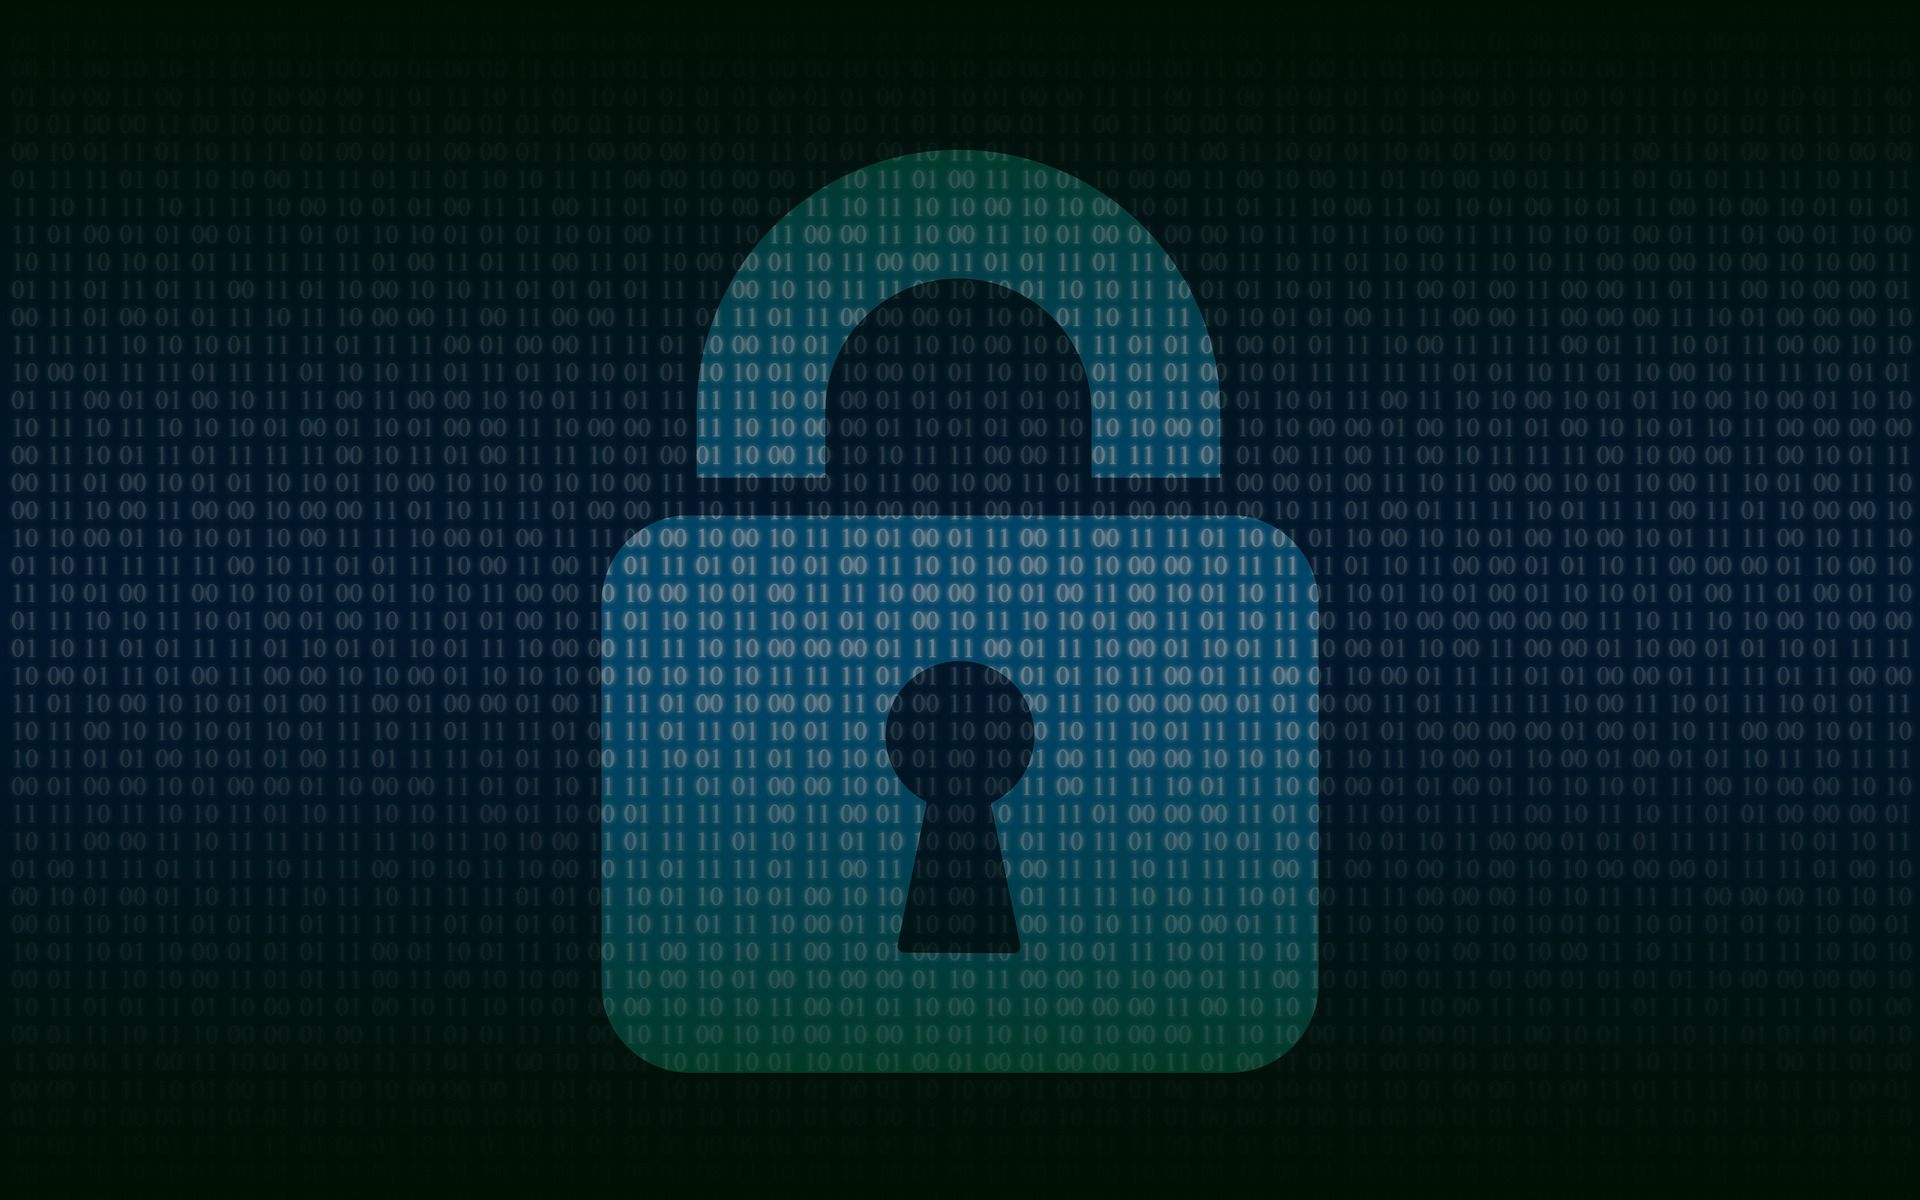 Privacy Rule according to HIPAA